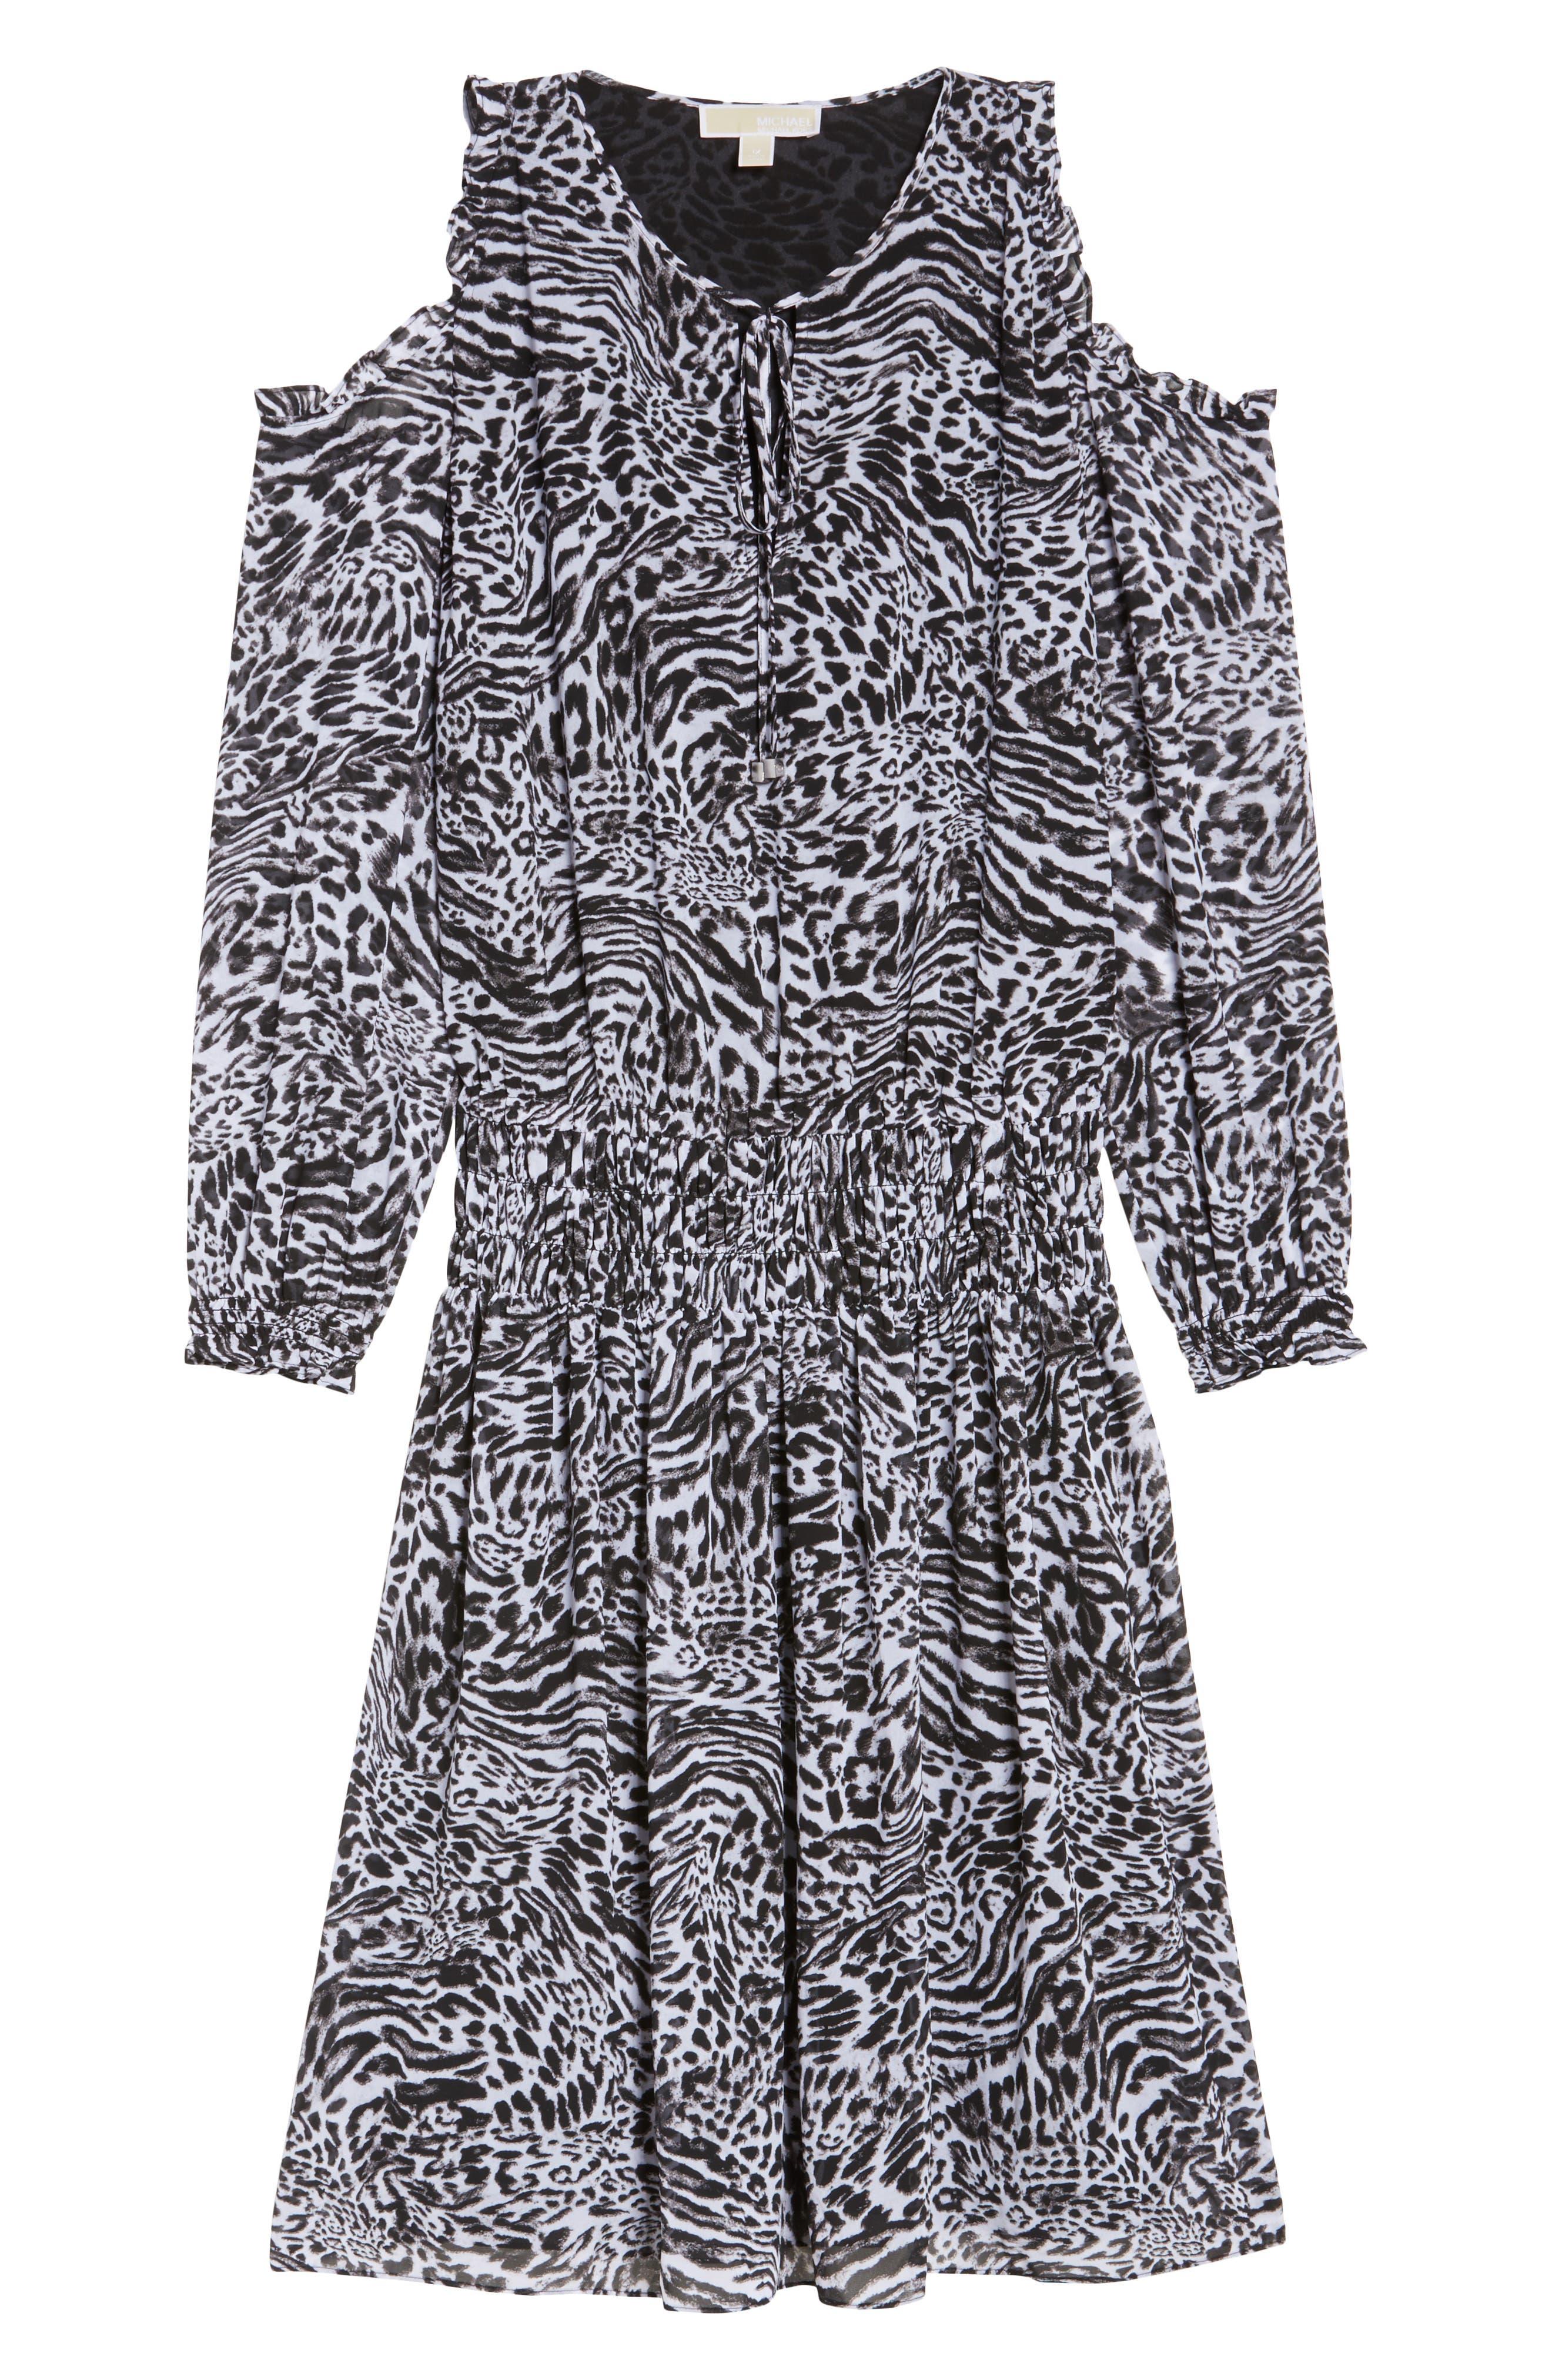 Big Cat Print Cold Shoulder Dress,                             Alternate thumbnail 6, color,                             001